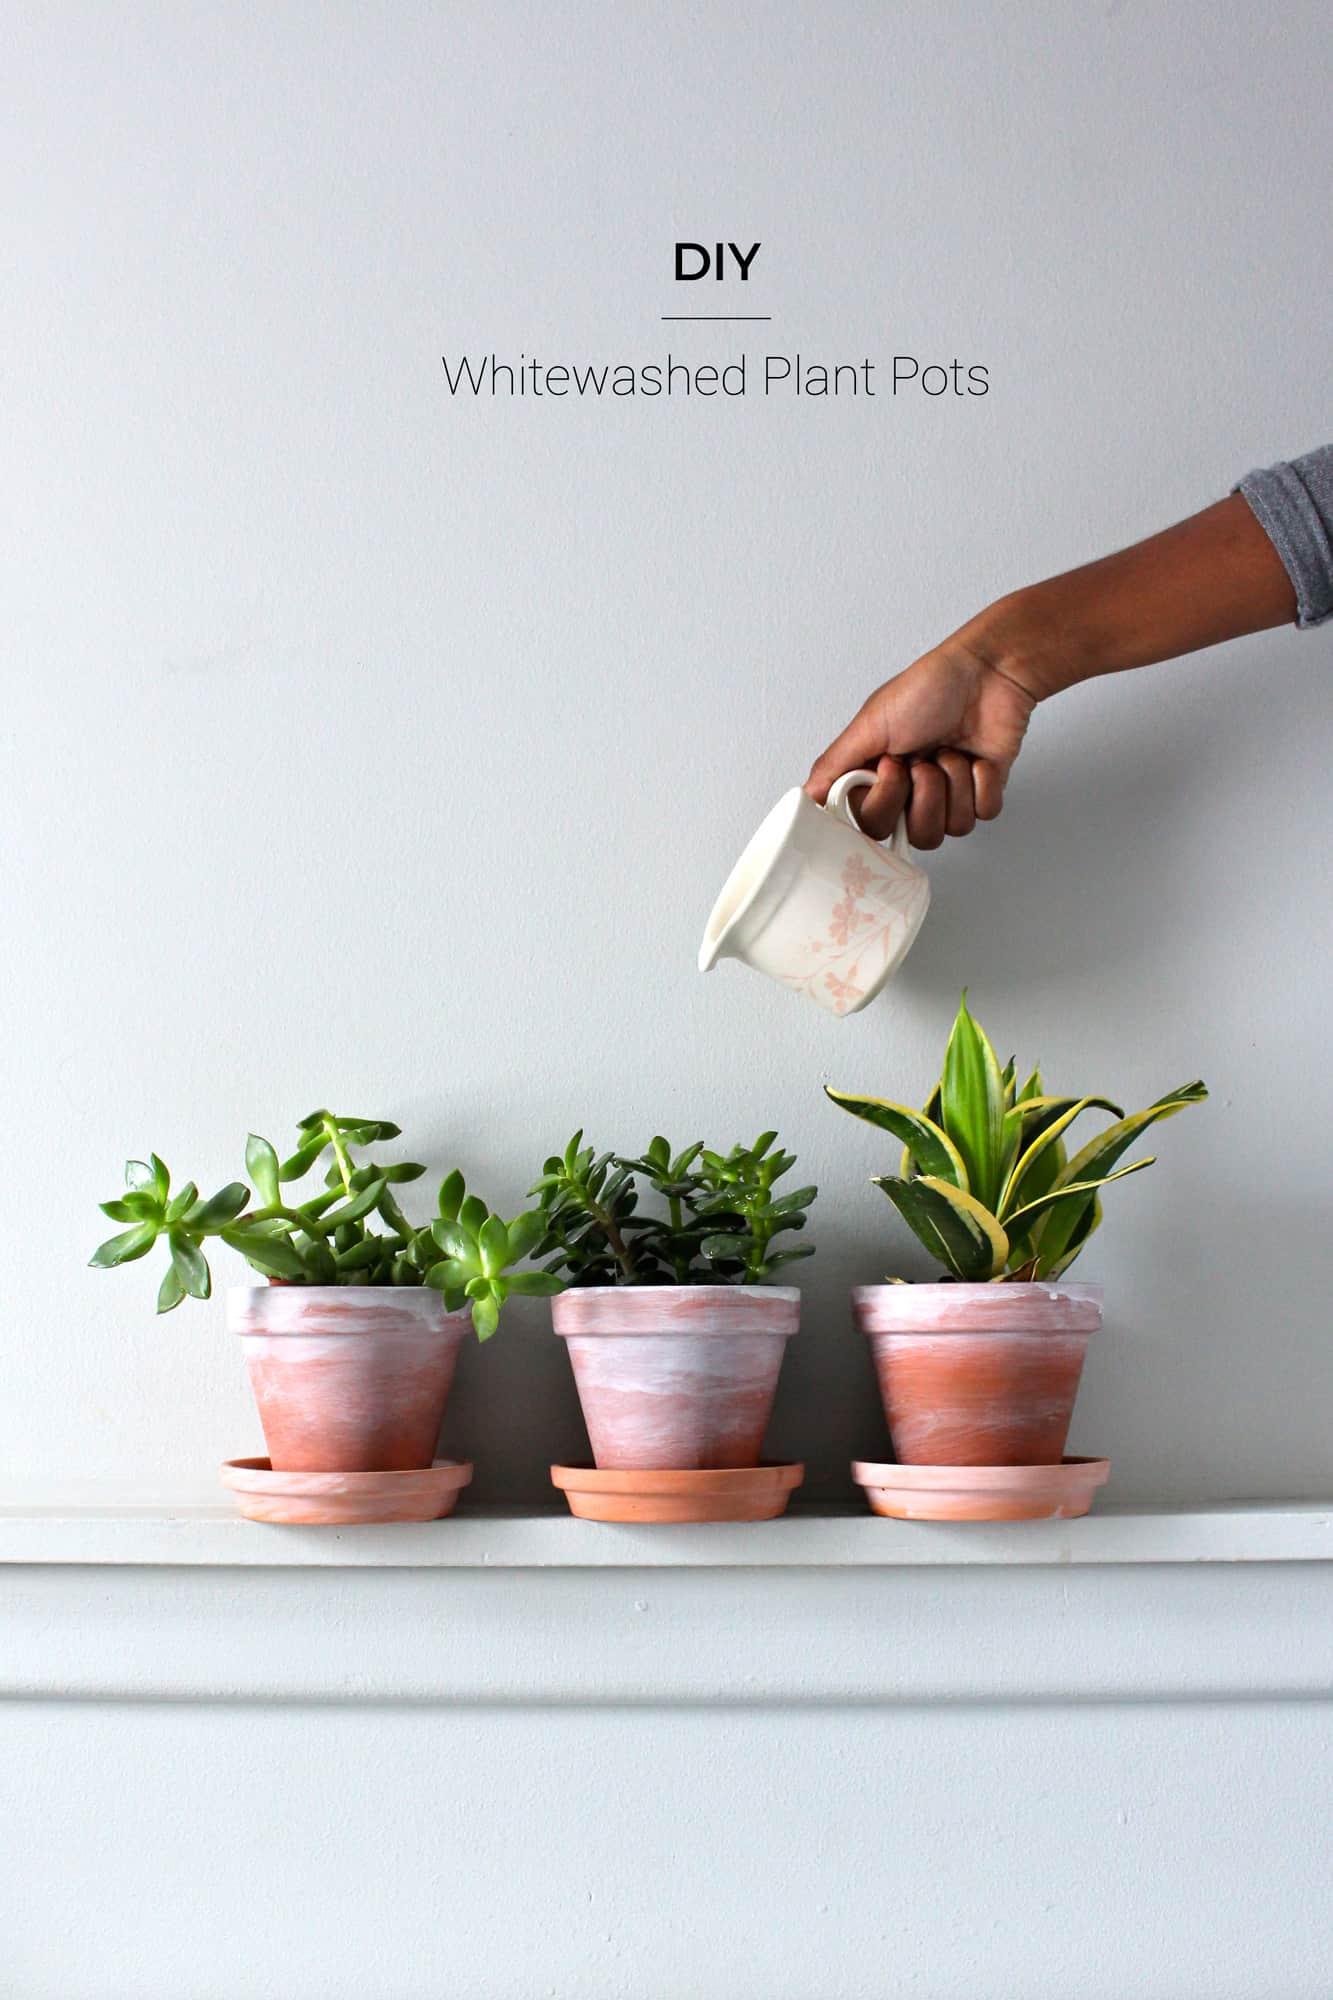 DIY Whitewashed Plant Pots   Fish & Bull